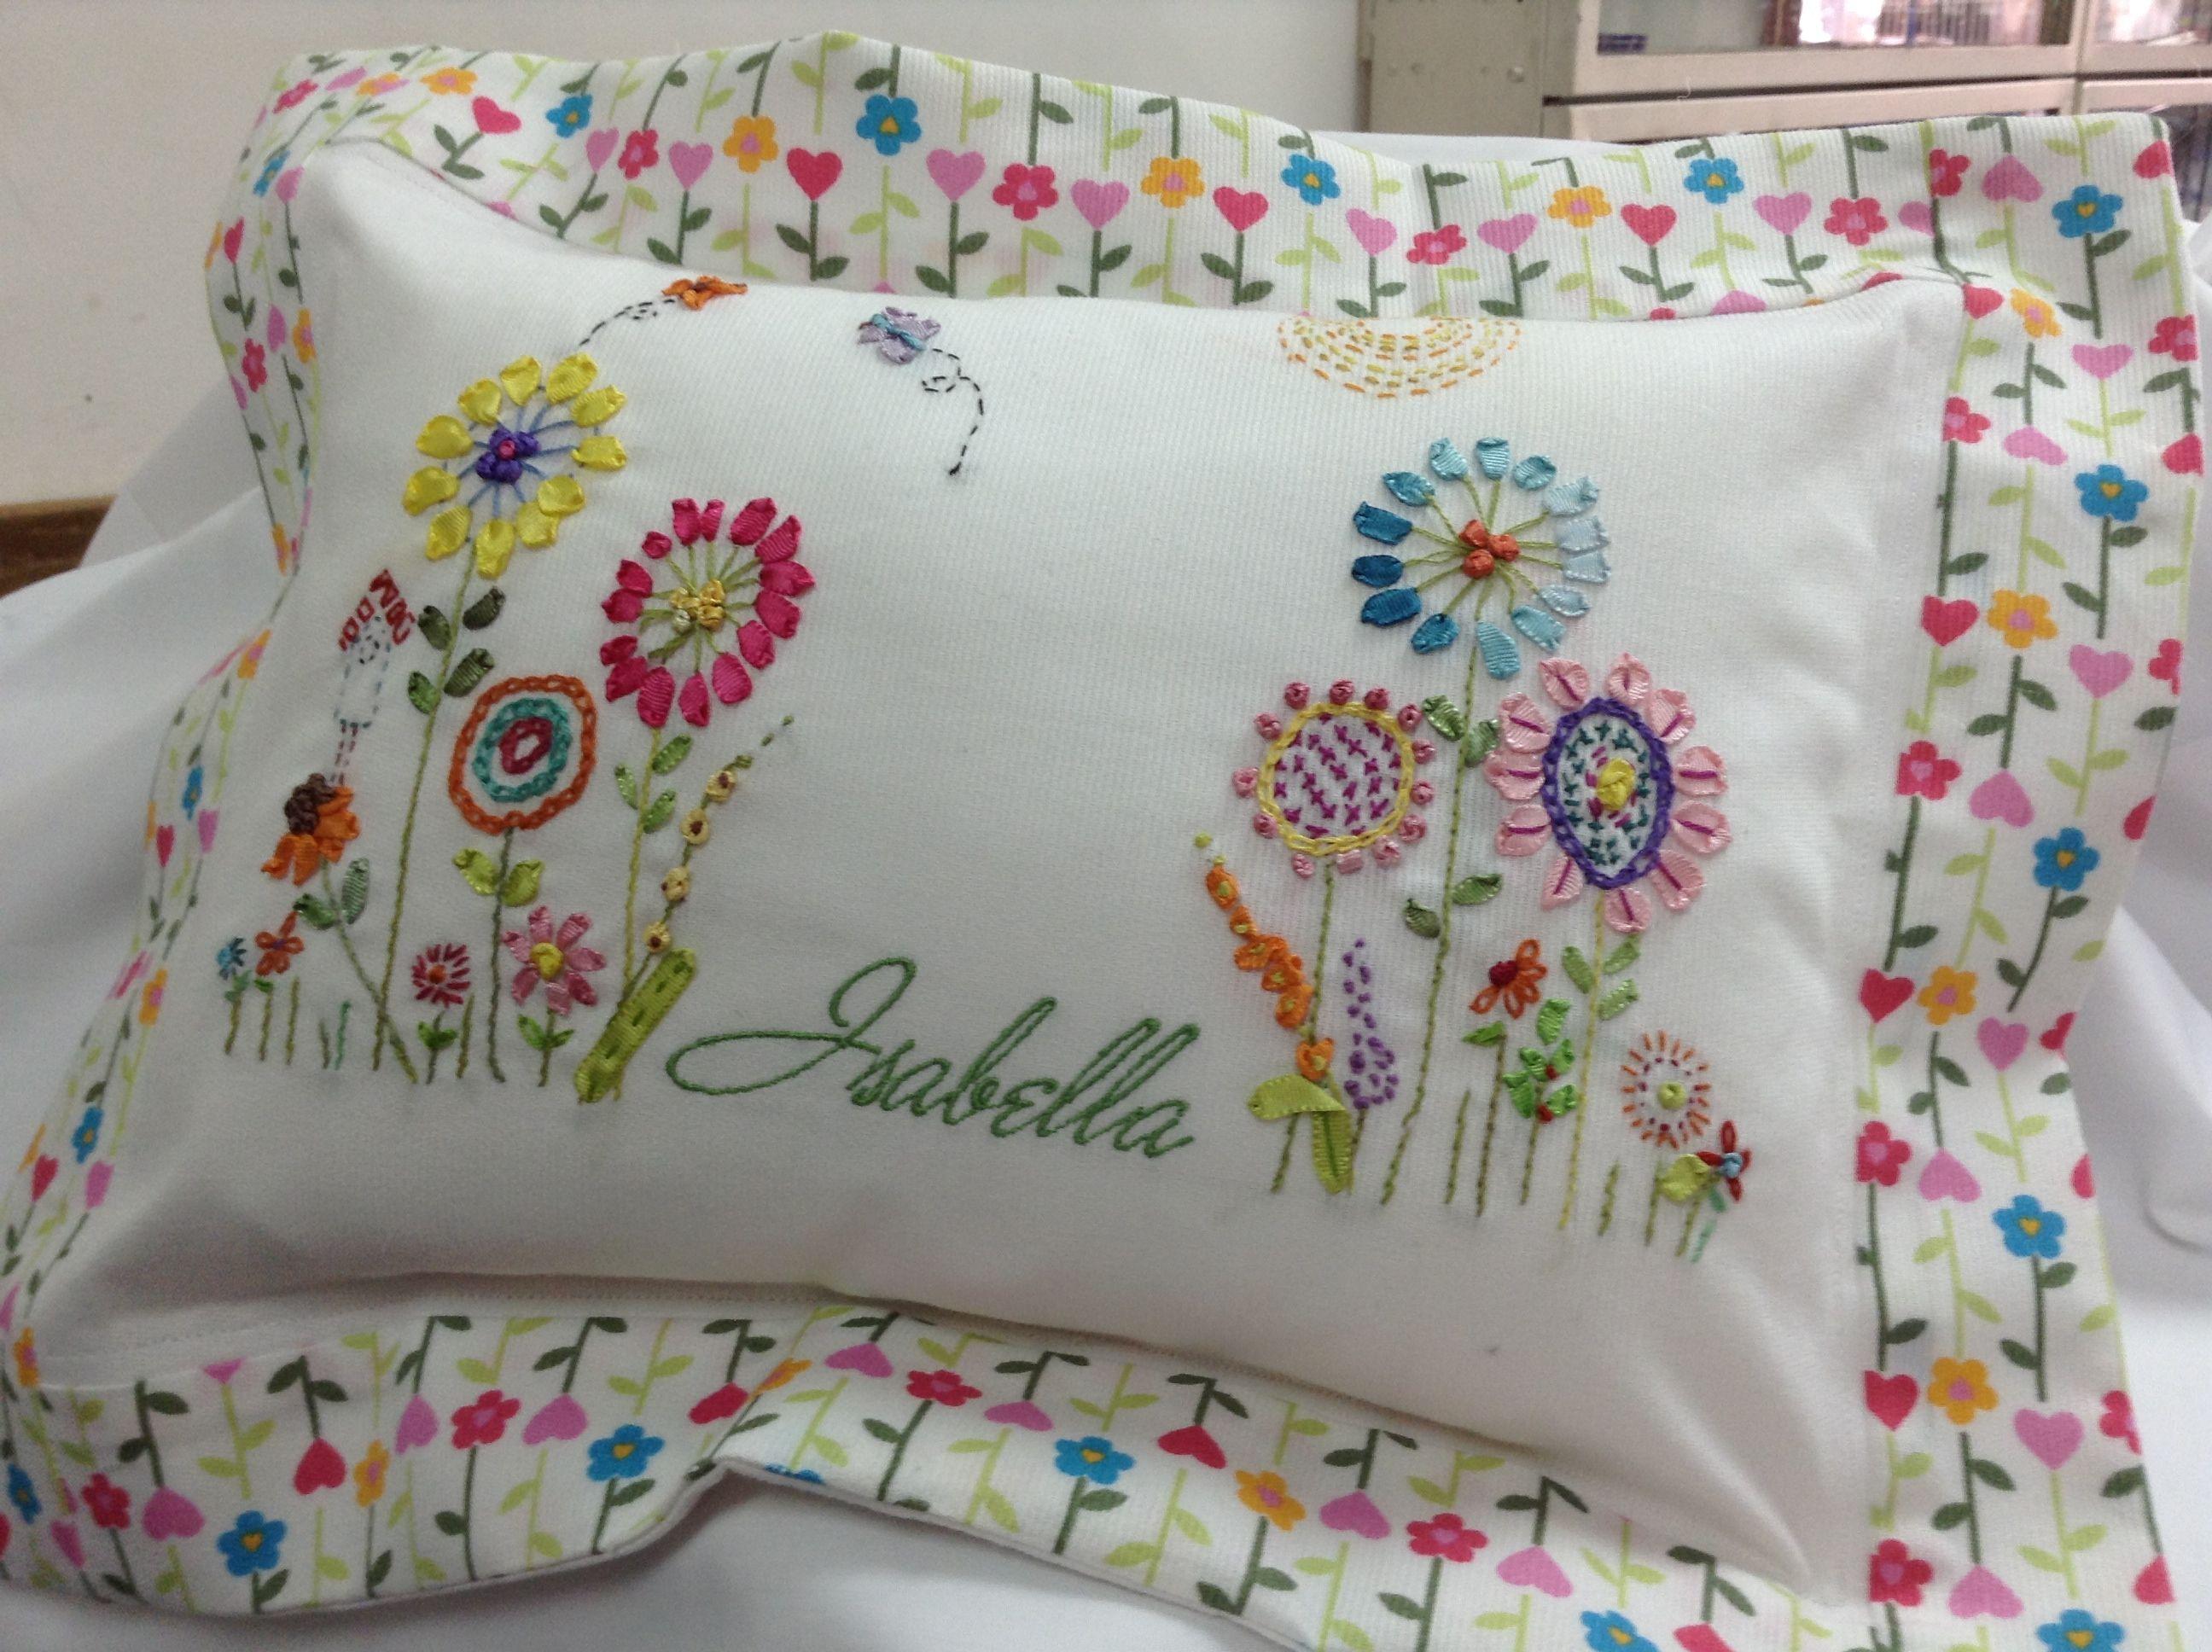 Ribbon embroidery bedspread designs - Bordado En Cinta Ver Facebook En Mechi Tati Creative Embroideryribbon